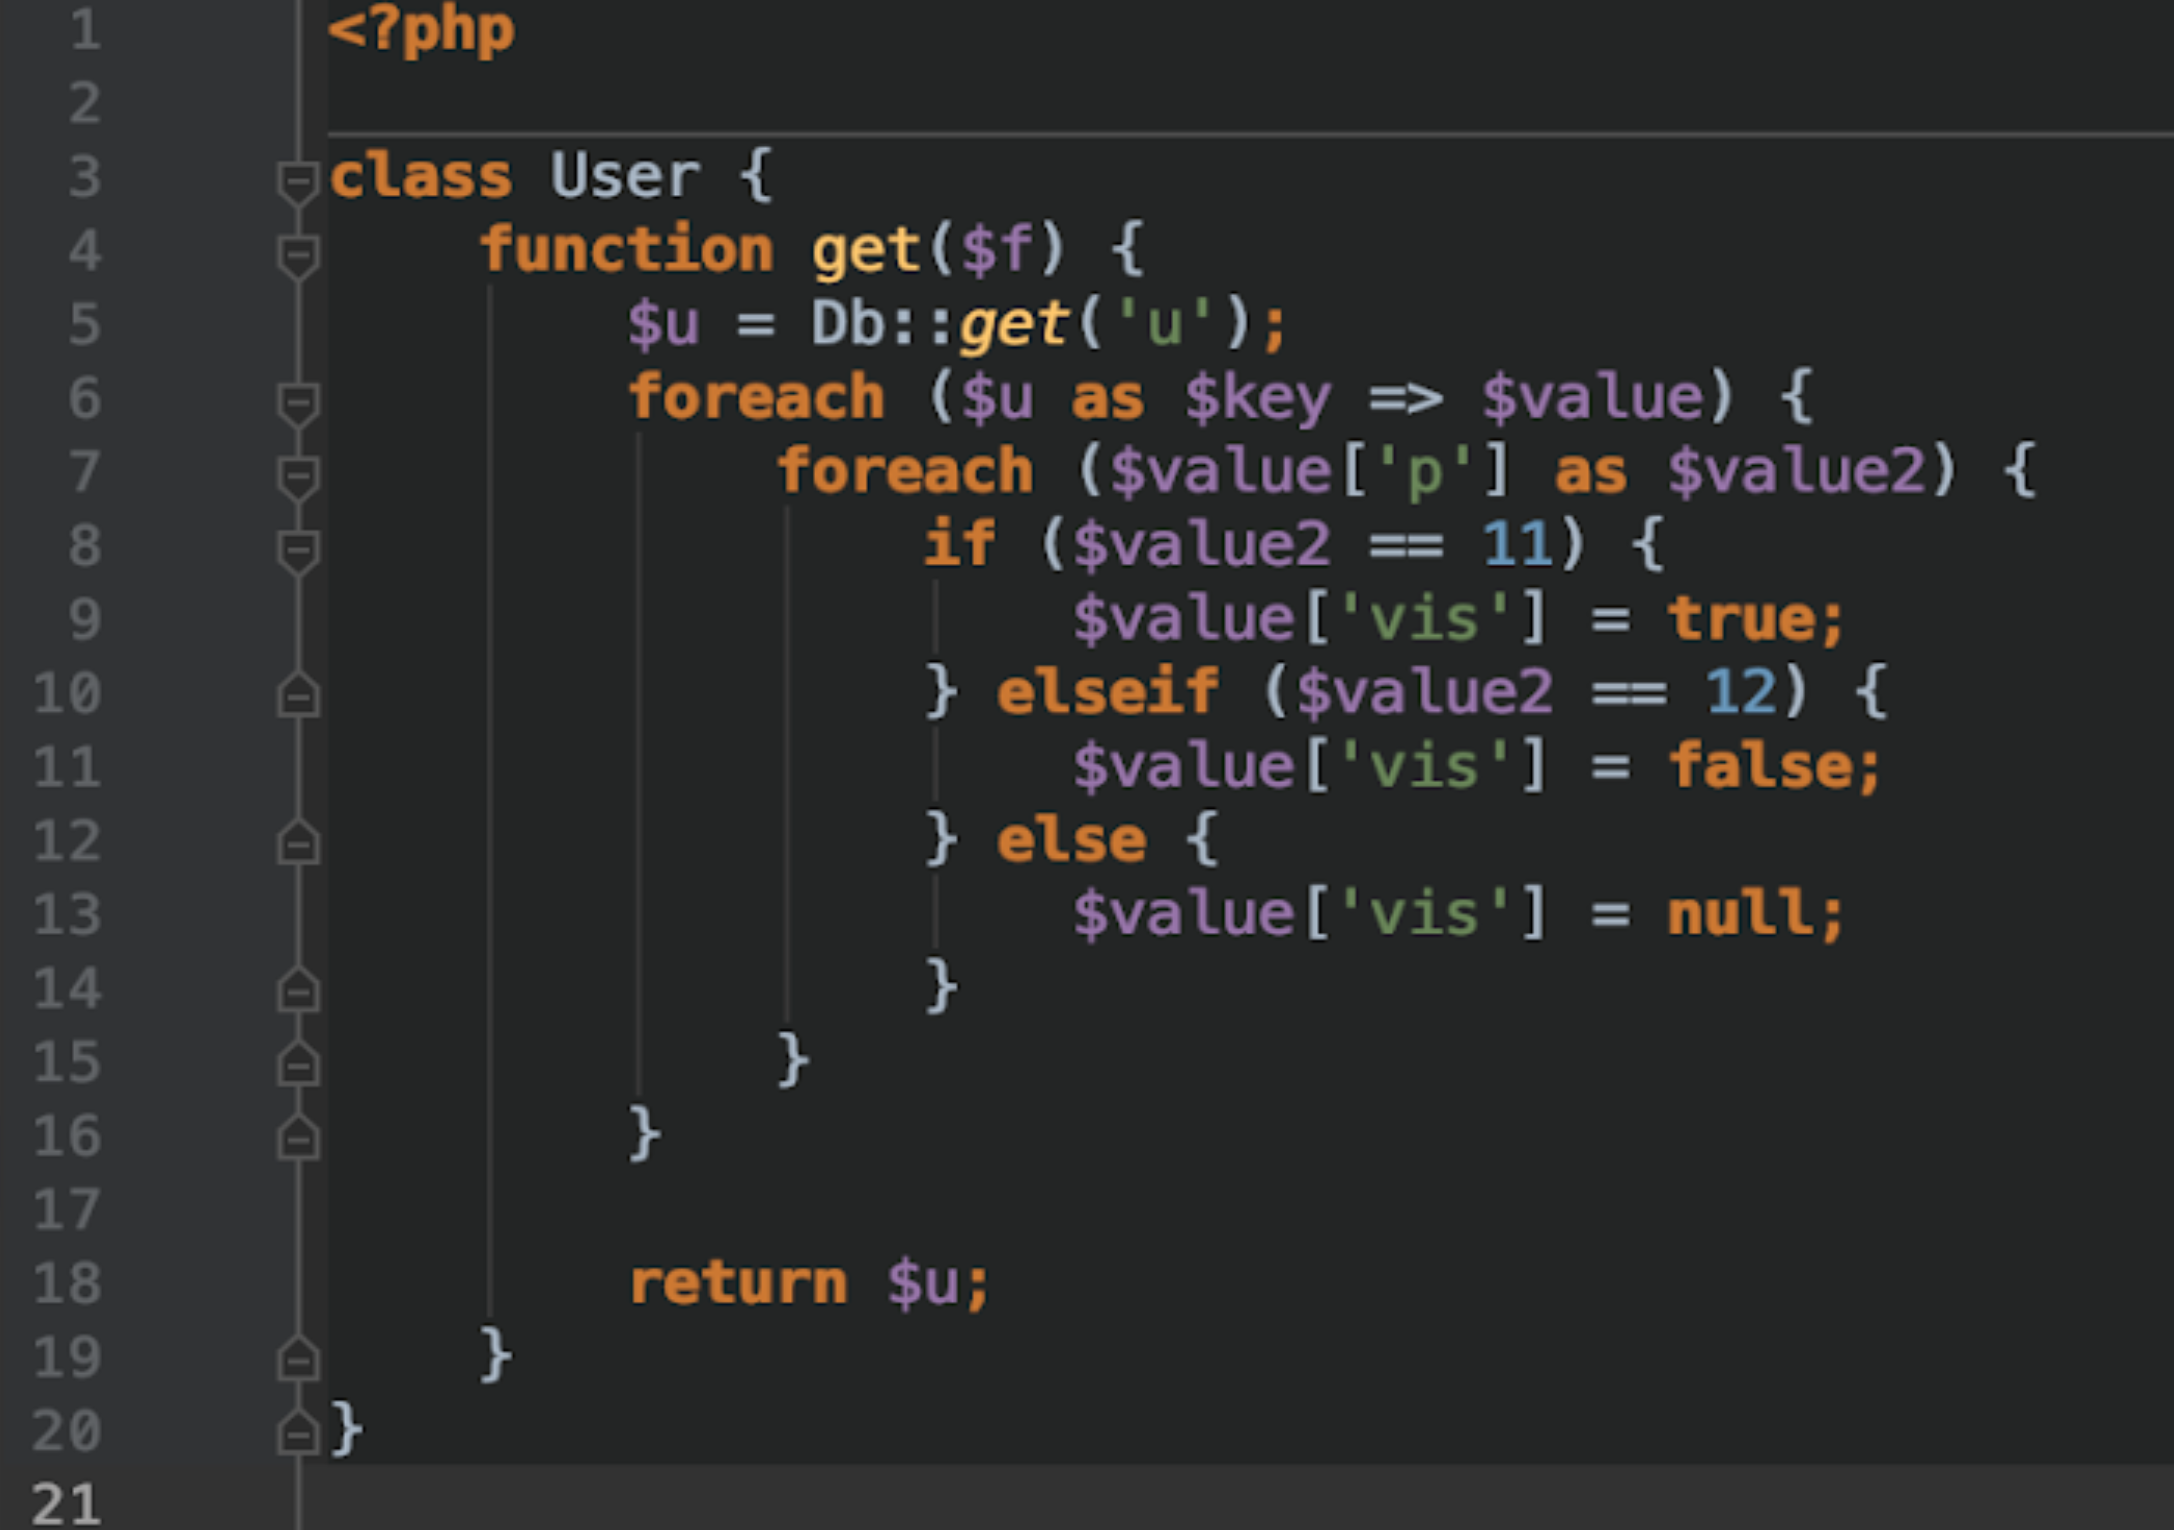 Code style как стандарт разработки - 6